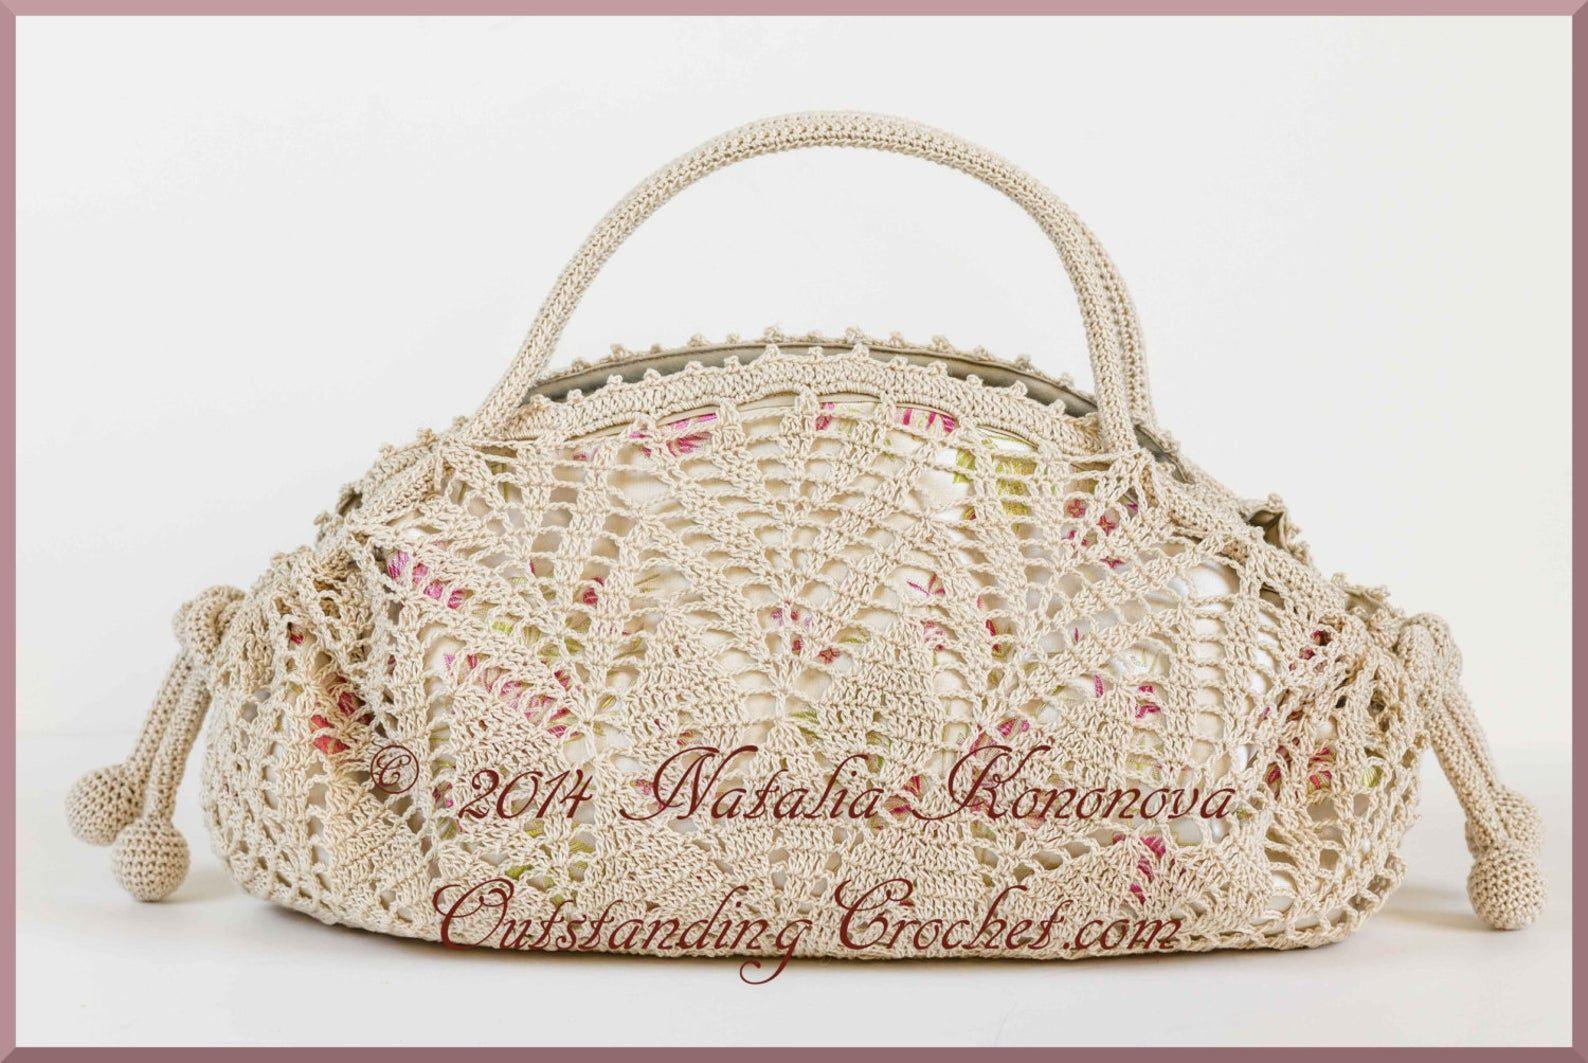 Crochet Bag PATTERN - Tea Rose Handbag - Crochet Doily Elegant Purse with Flowers and Leaves Irish Crochet Motifs Embellishment - PDF